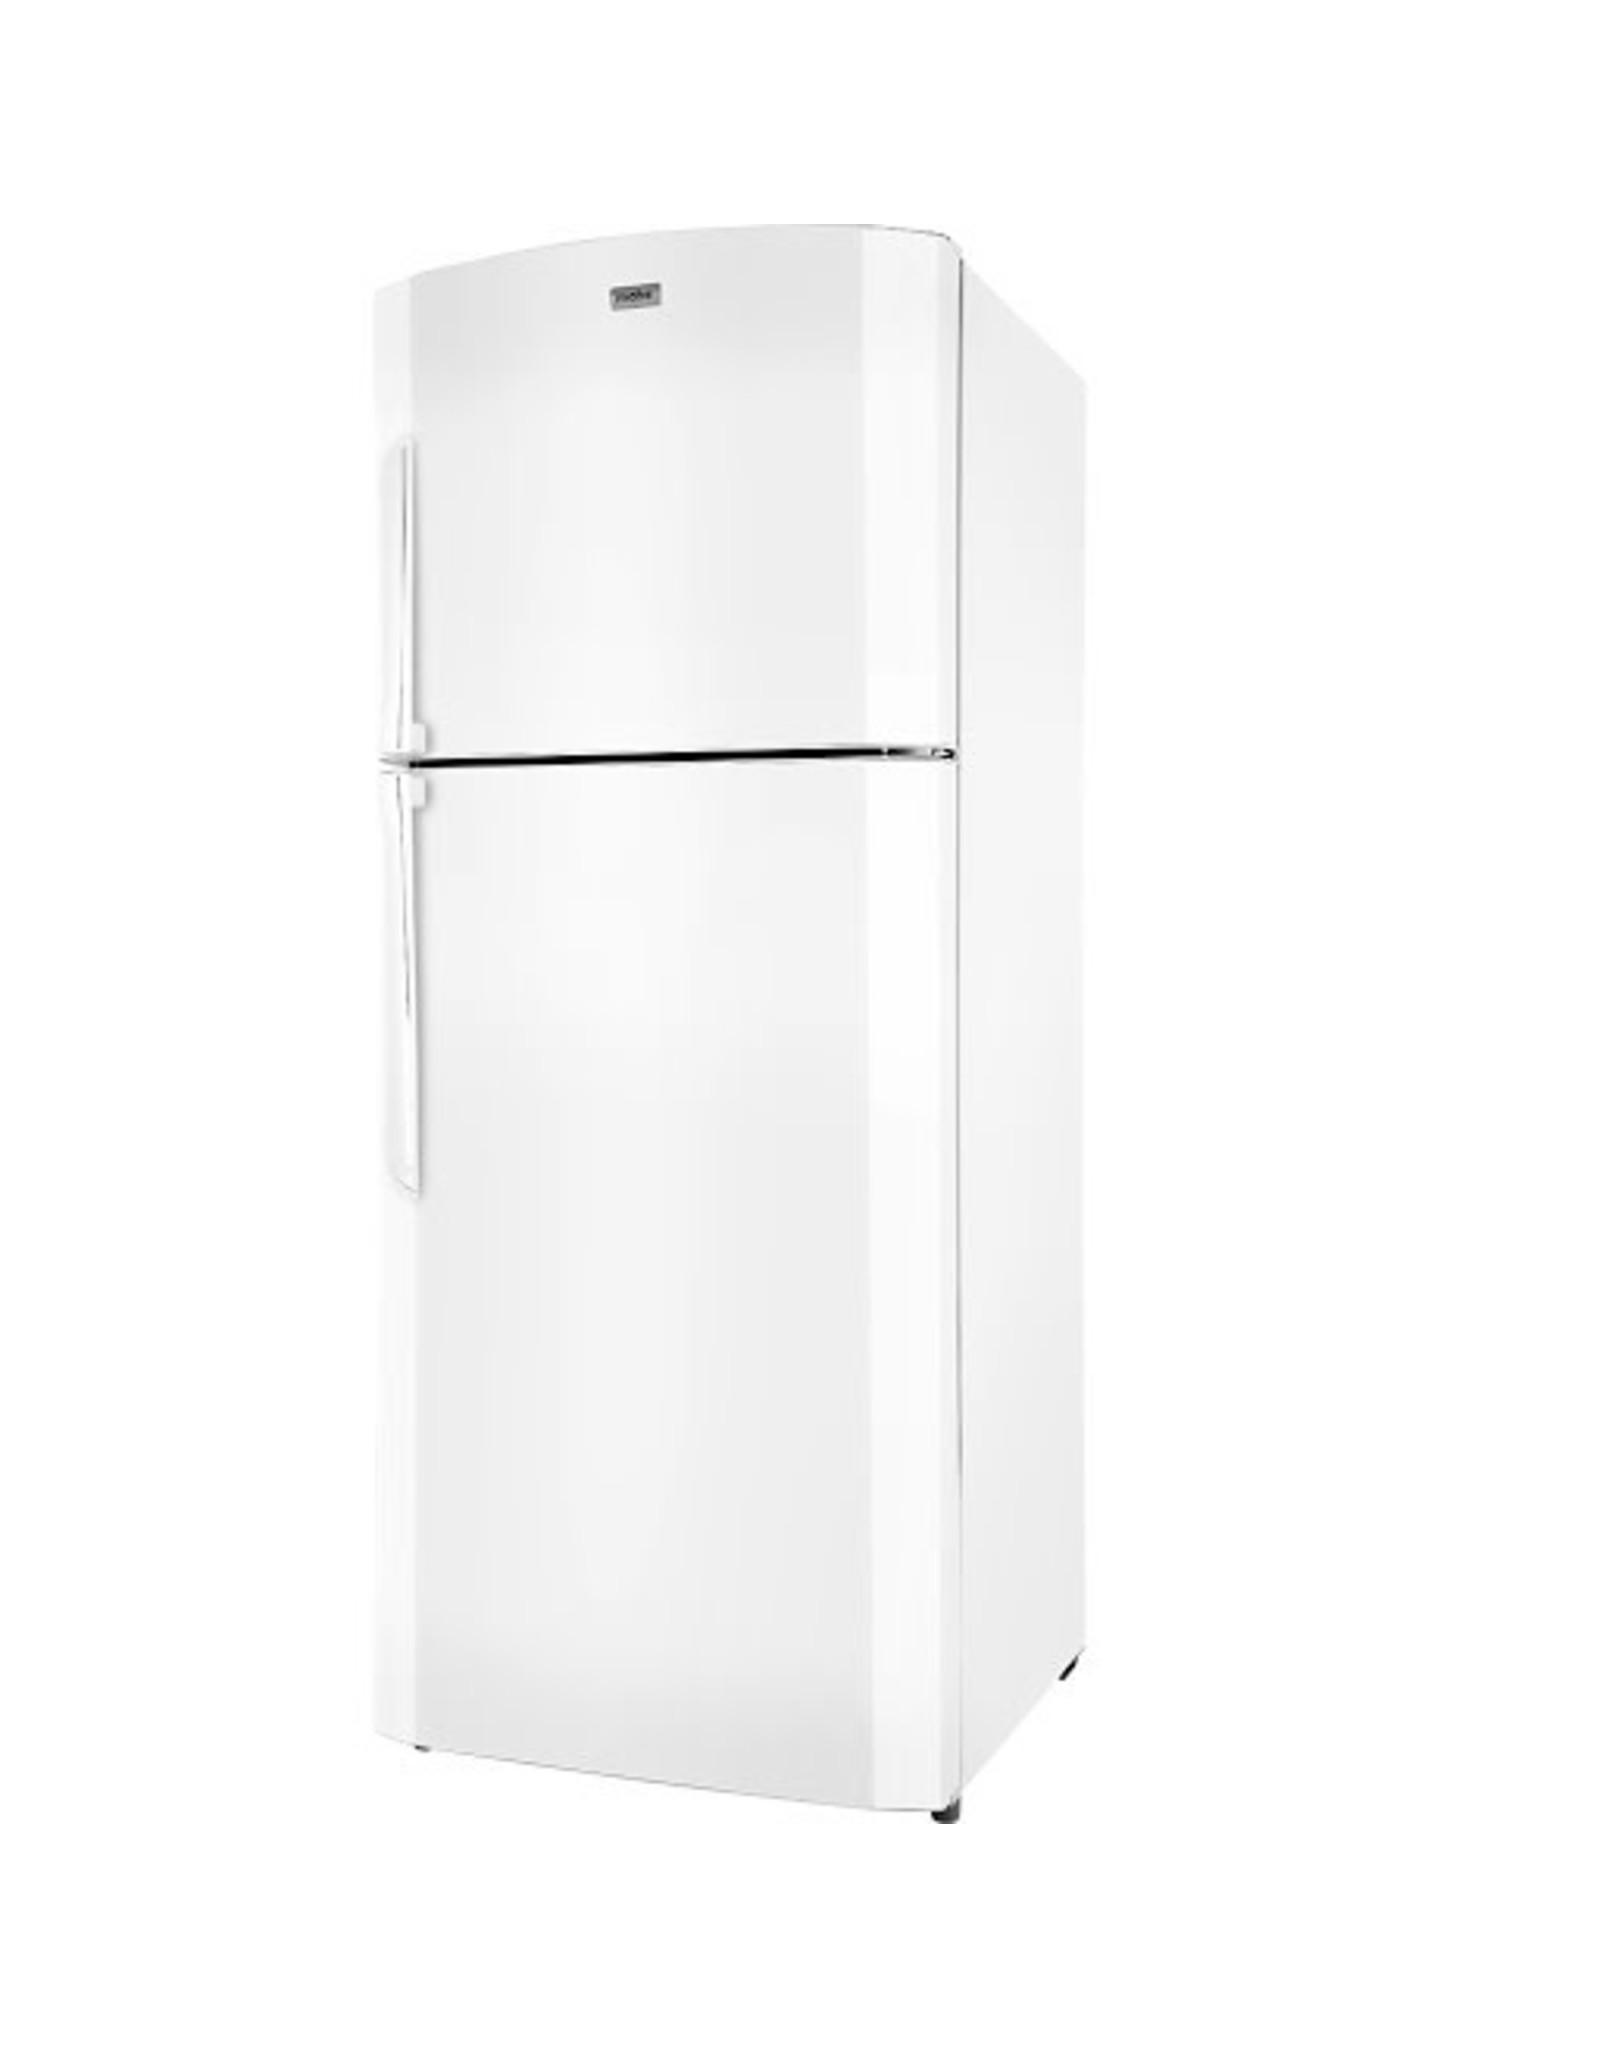 Mabe Mabe Refrigerator 19 ft White RMT510RXMRB0